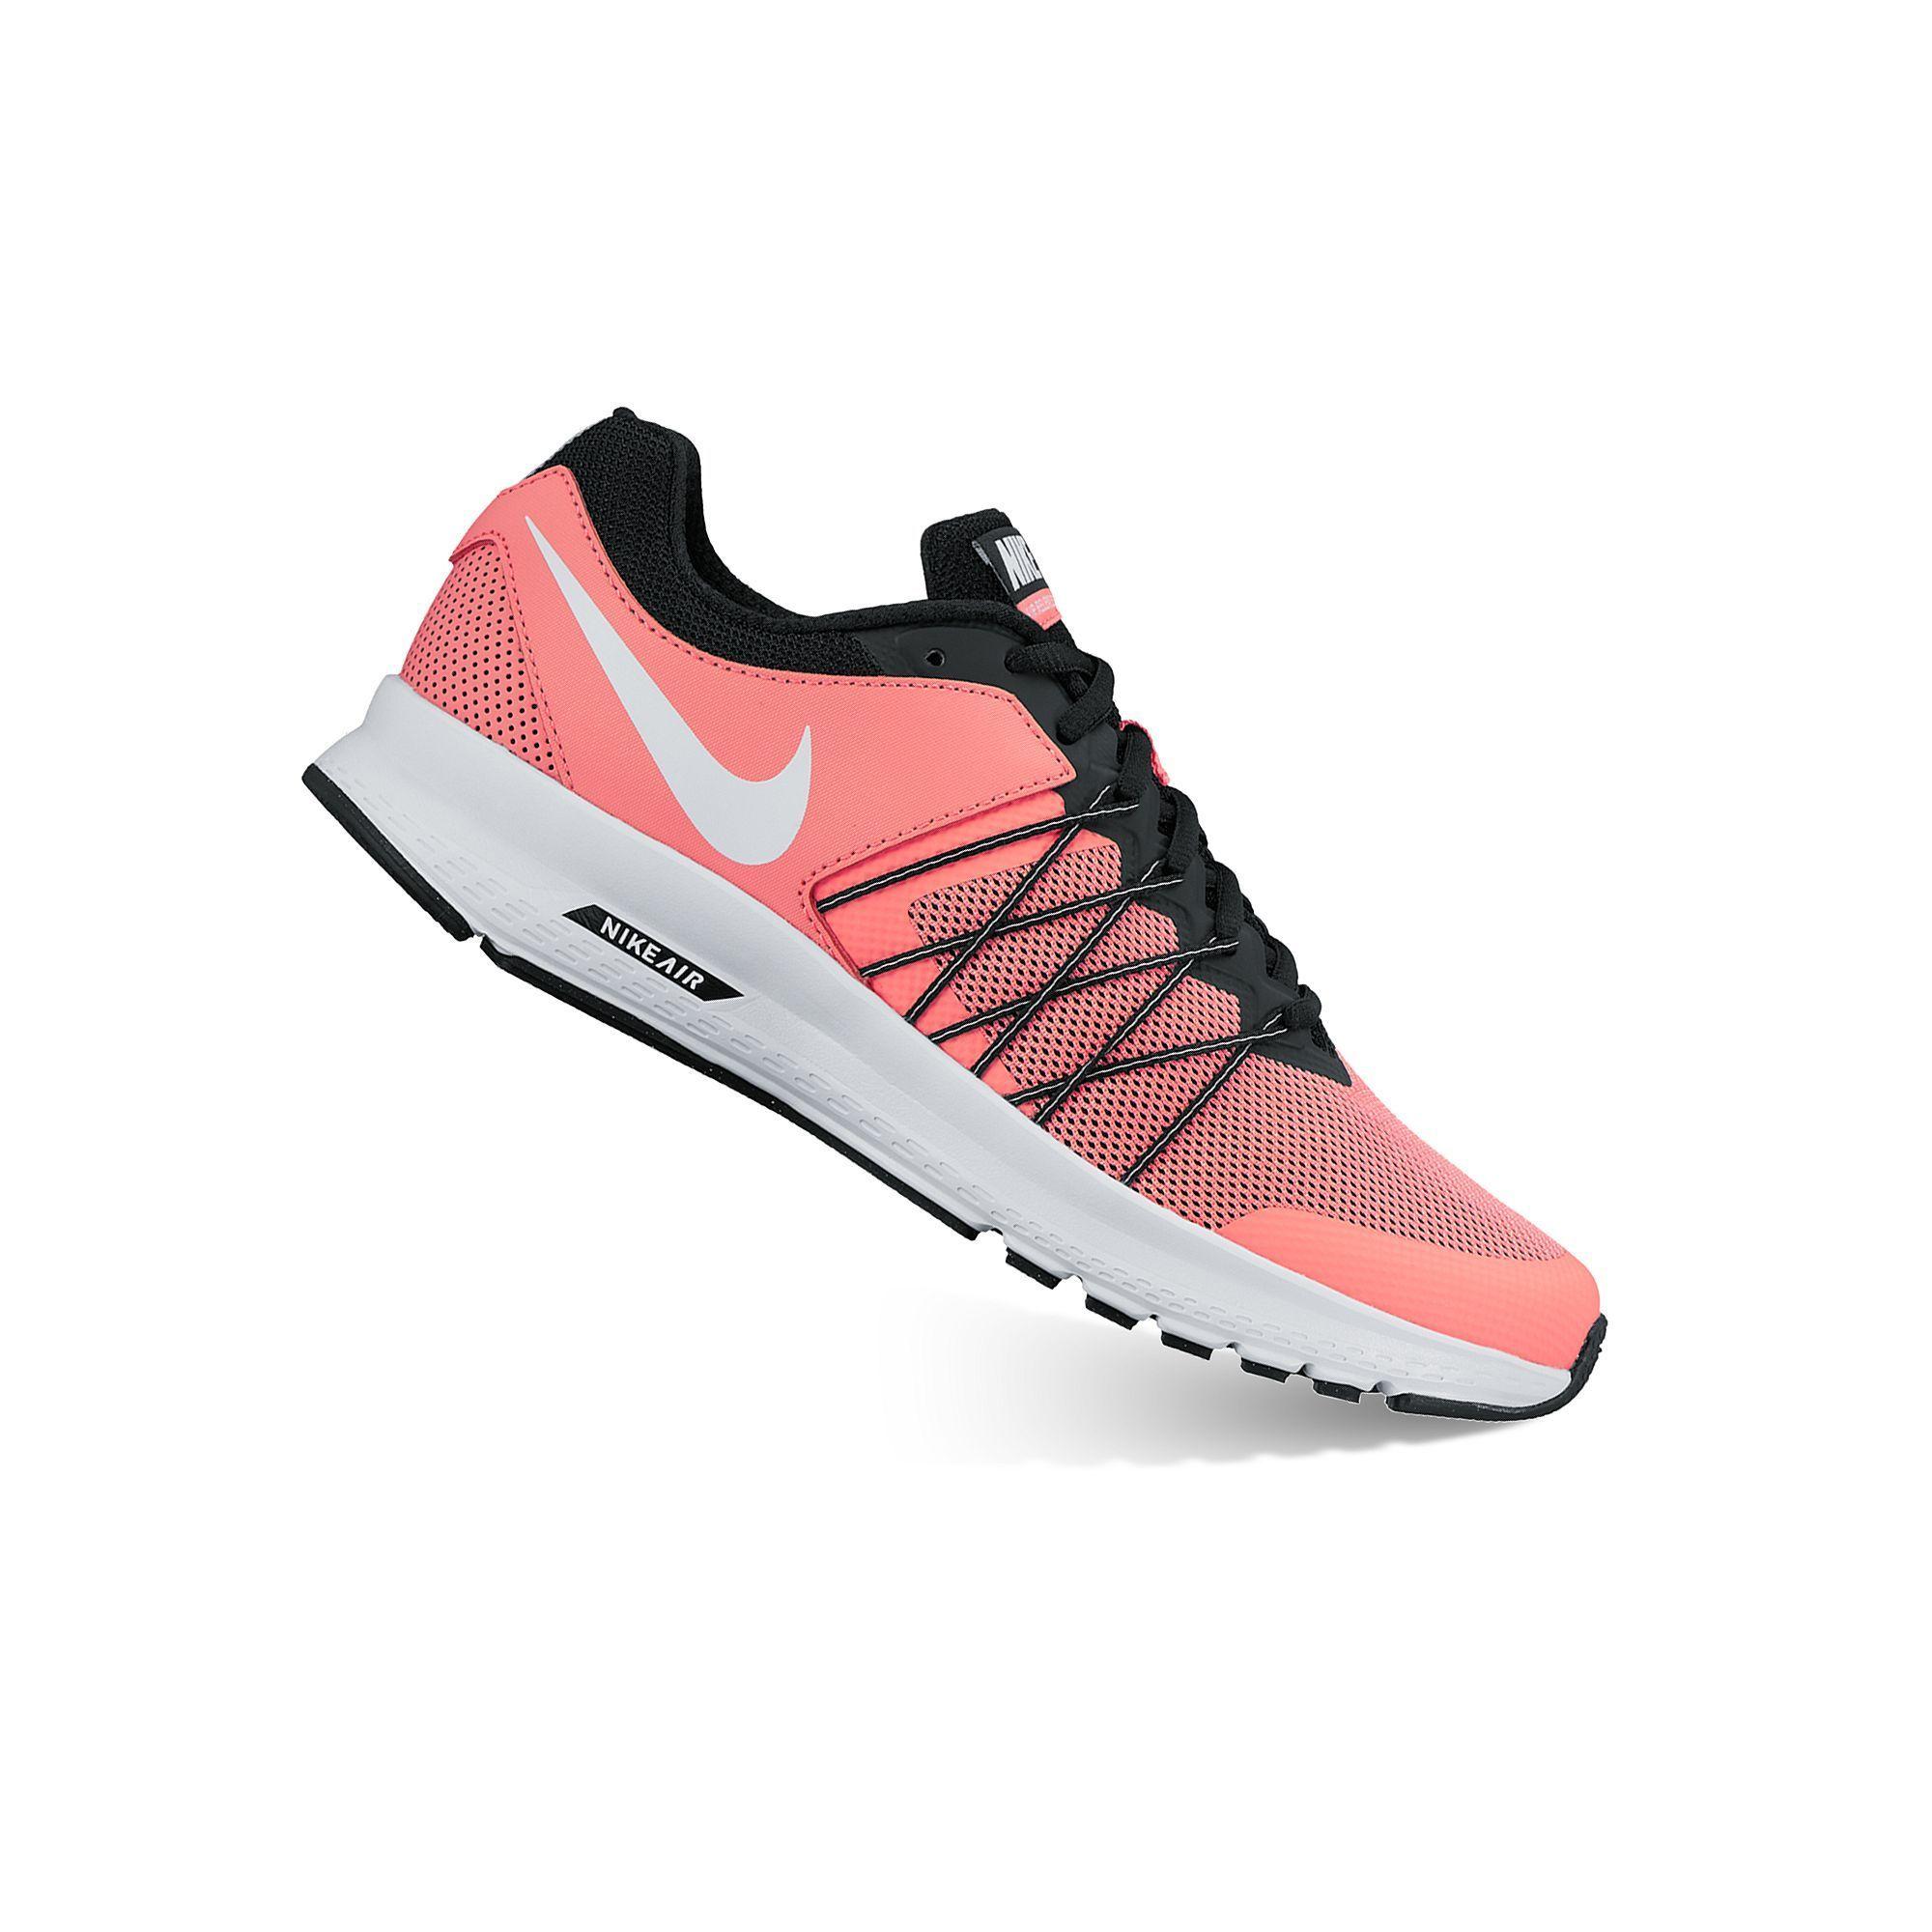 super popular 8d1b8 e2165 Nike Air Relentless 6 Women's Running Shoes | Products ...